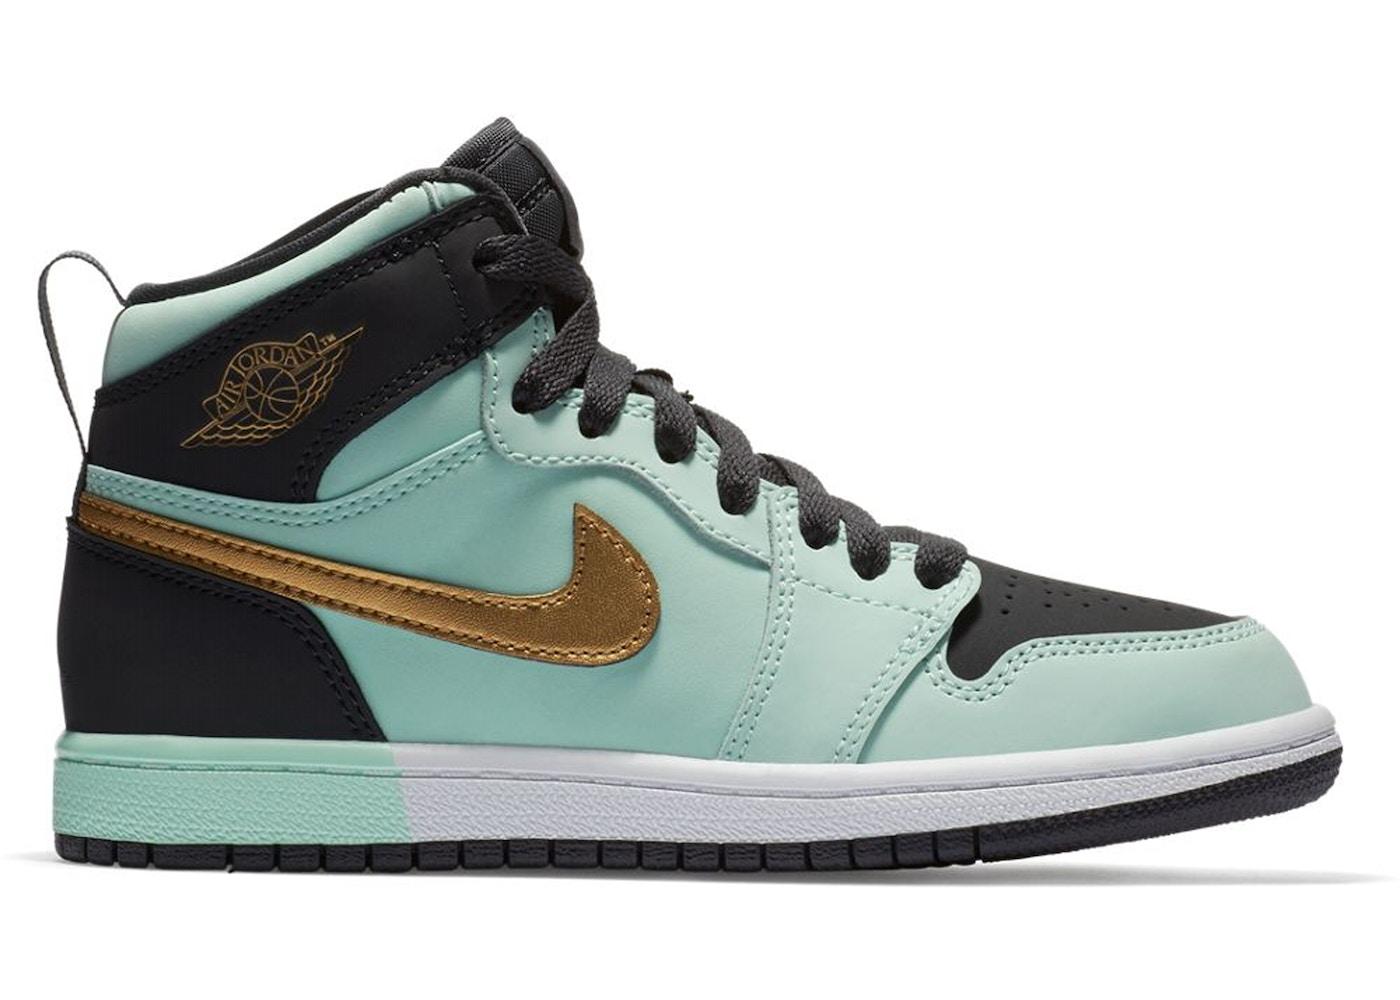 sports shoes ba085 b5c50 Jordan 1 Retro High Mint Foam Anthracite Metallic Gold (PS) - 705321-300